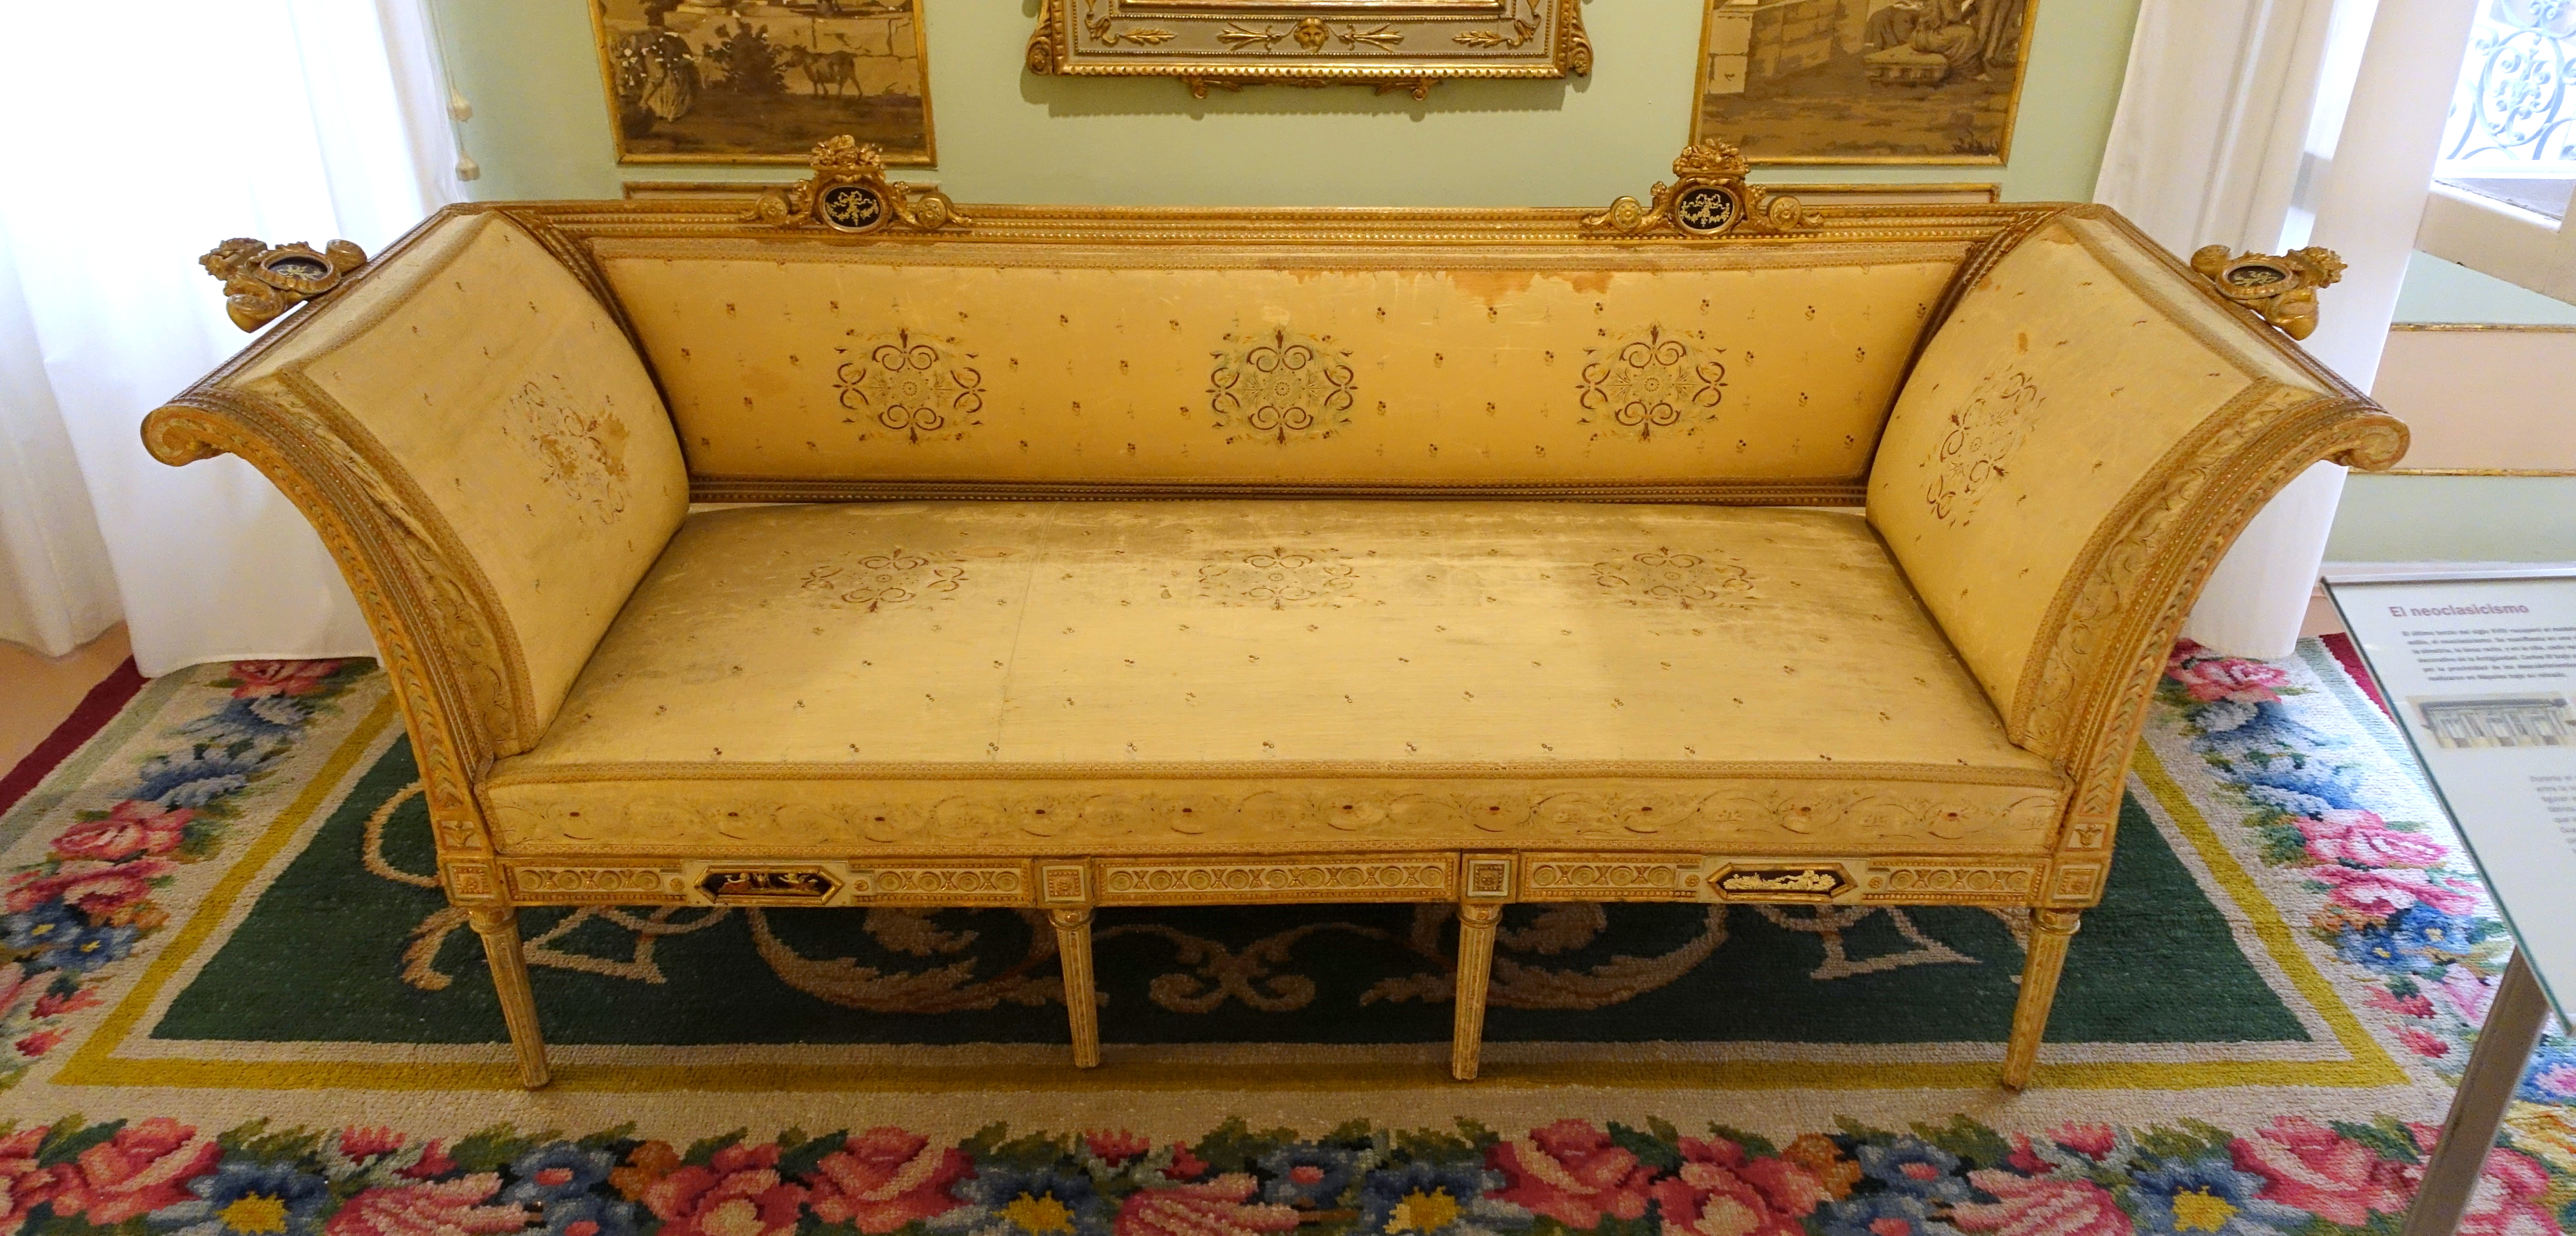 File sofa sultana real taller de ebanisteria madrid 1802 pine museo nacional de artes - Taller de ebanisteria ...